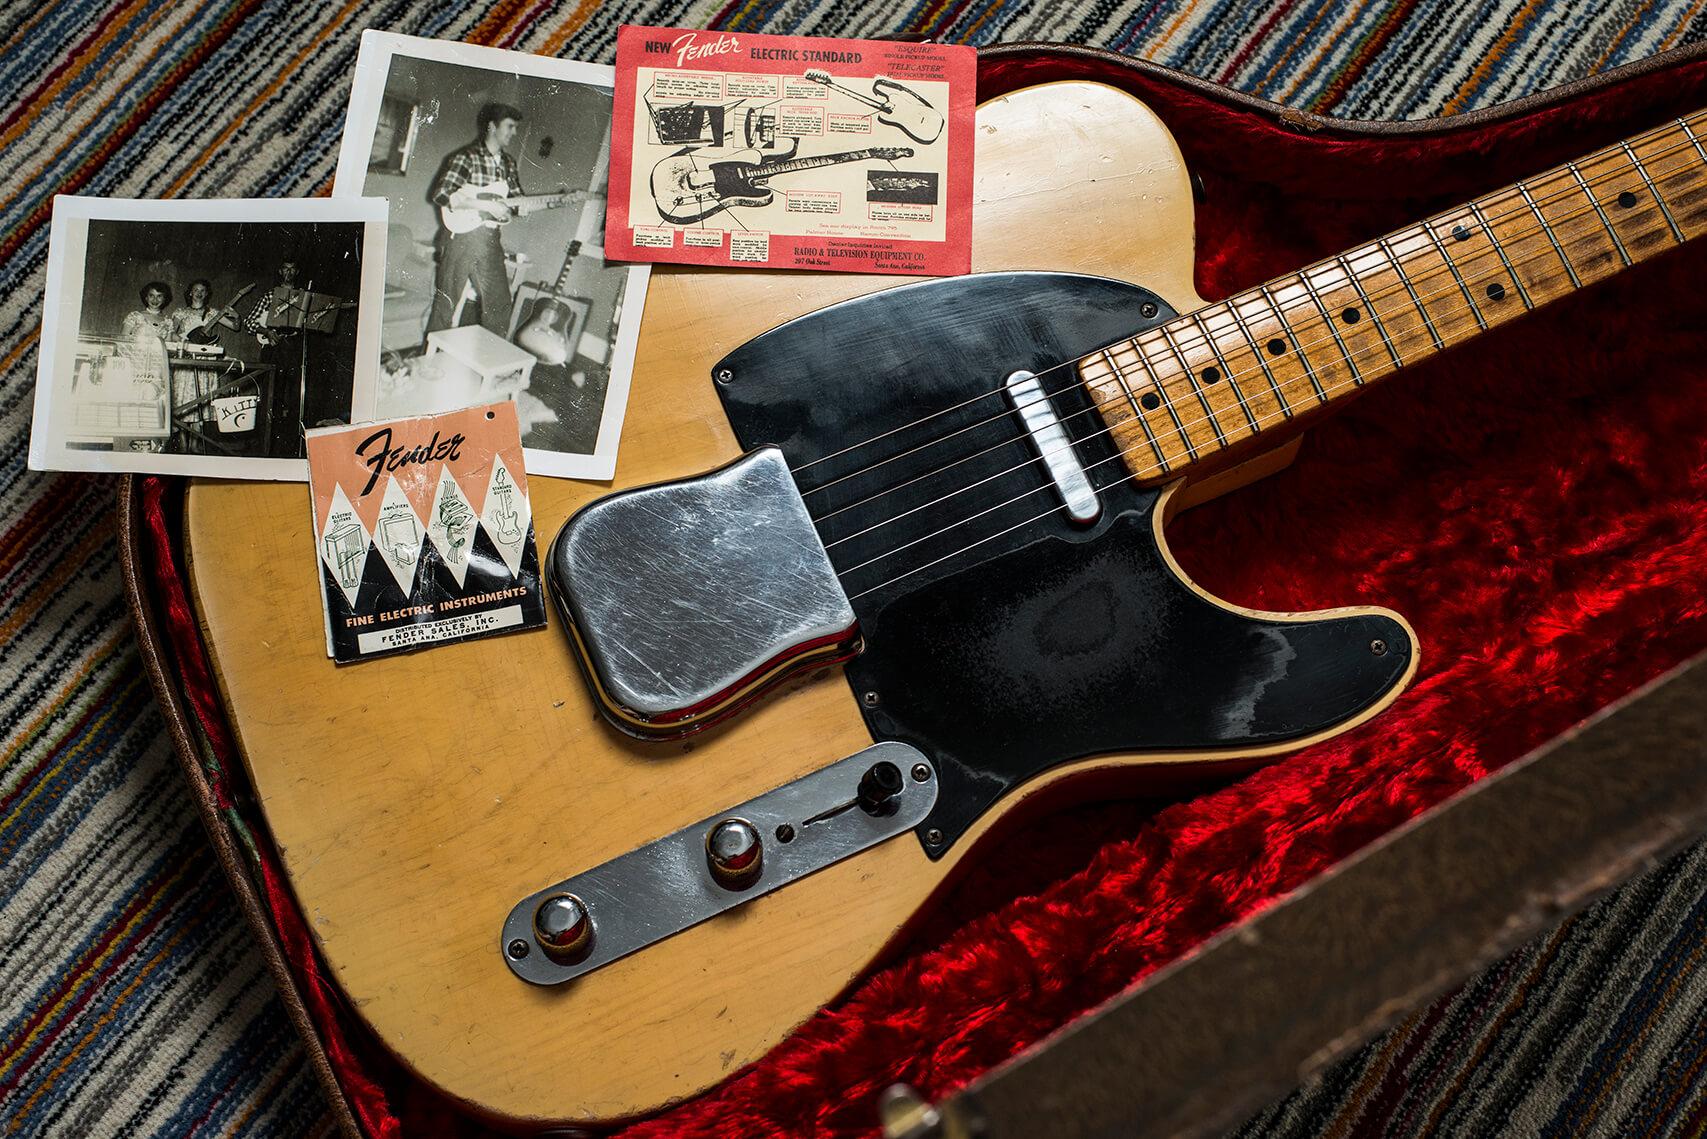 Jeff Garlin's 1953 Fender Telecaster Body (Case)